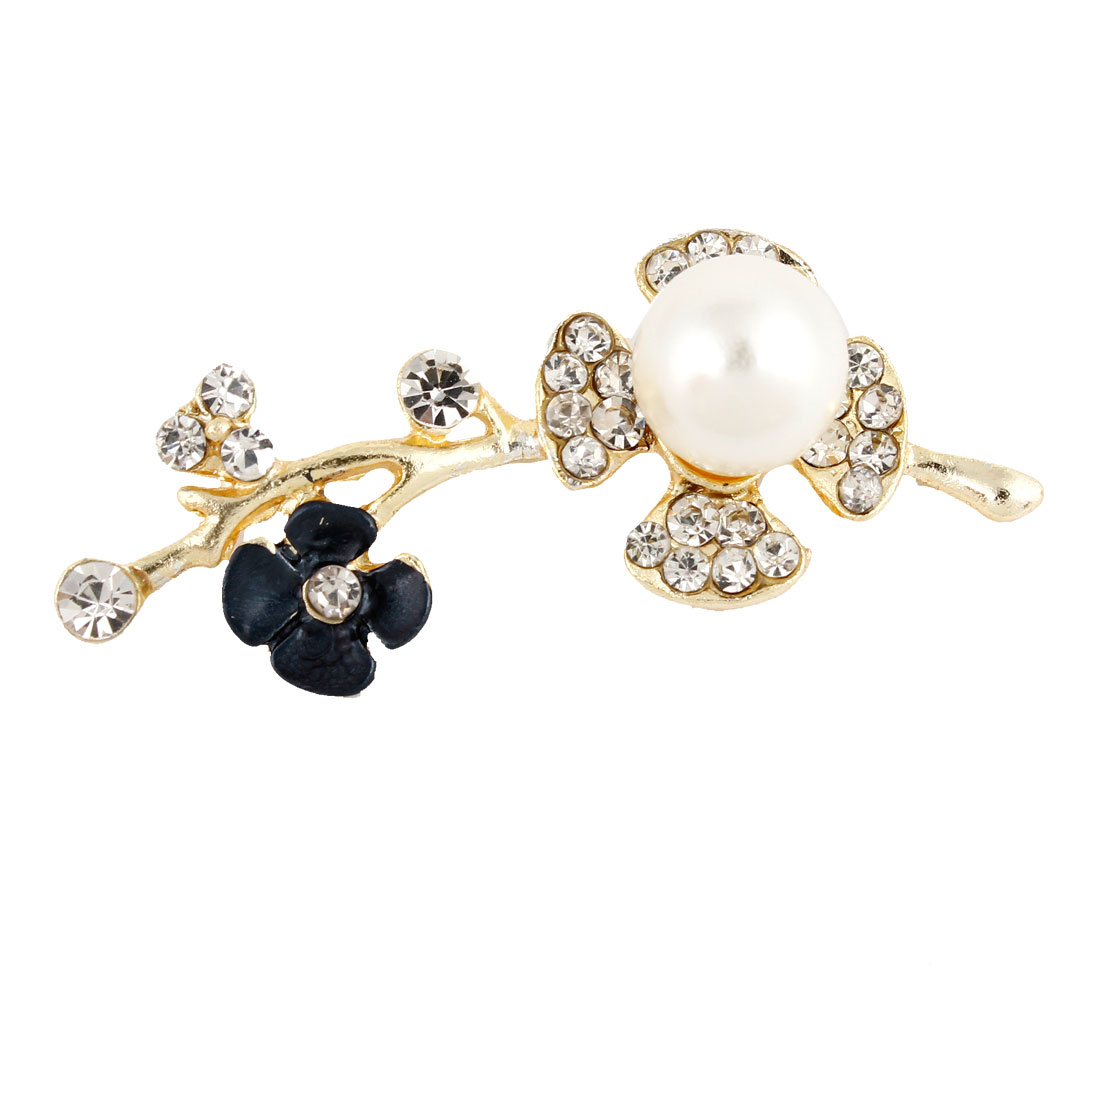 Lady Gold Tone Rhinestones Embellished Flower Decor Brooch Breast Pin